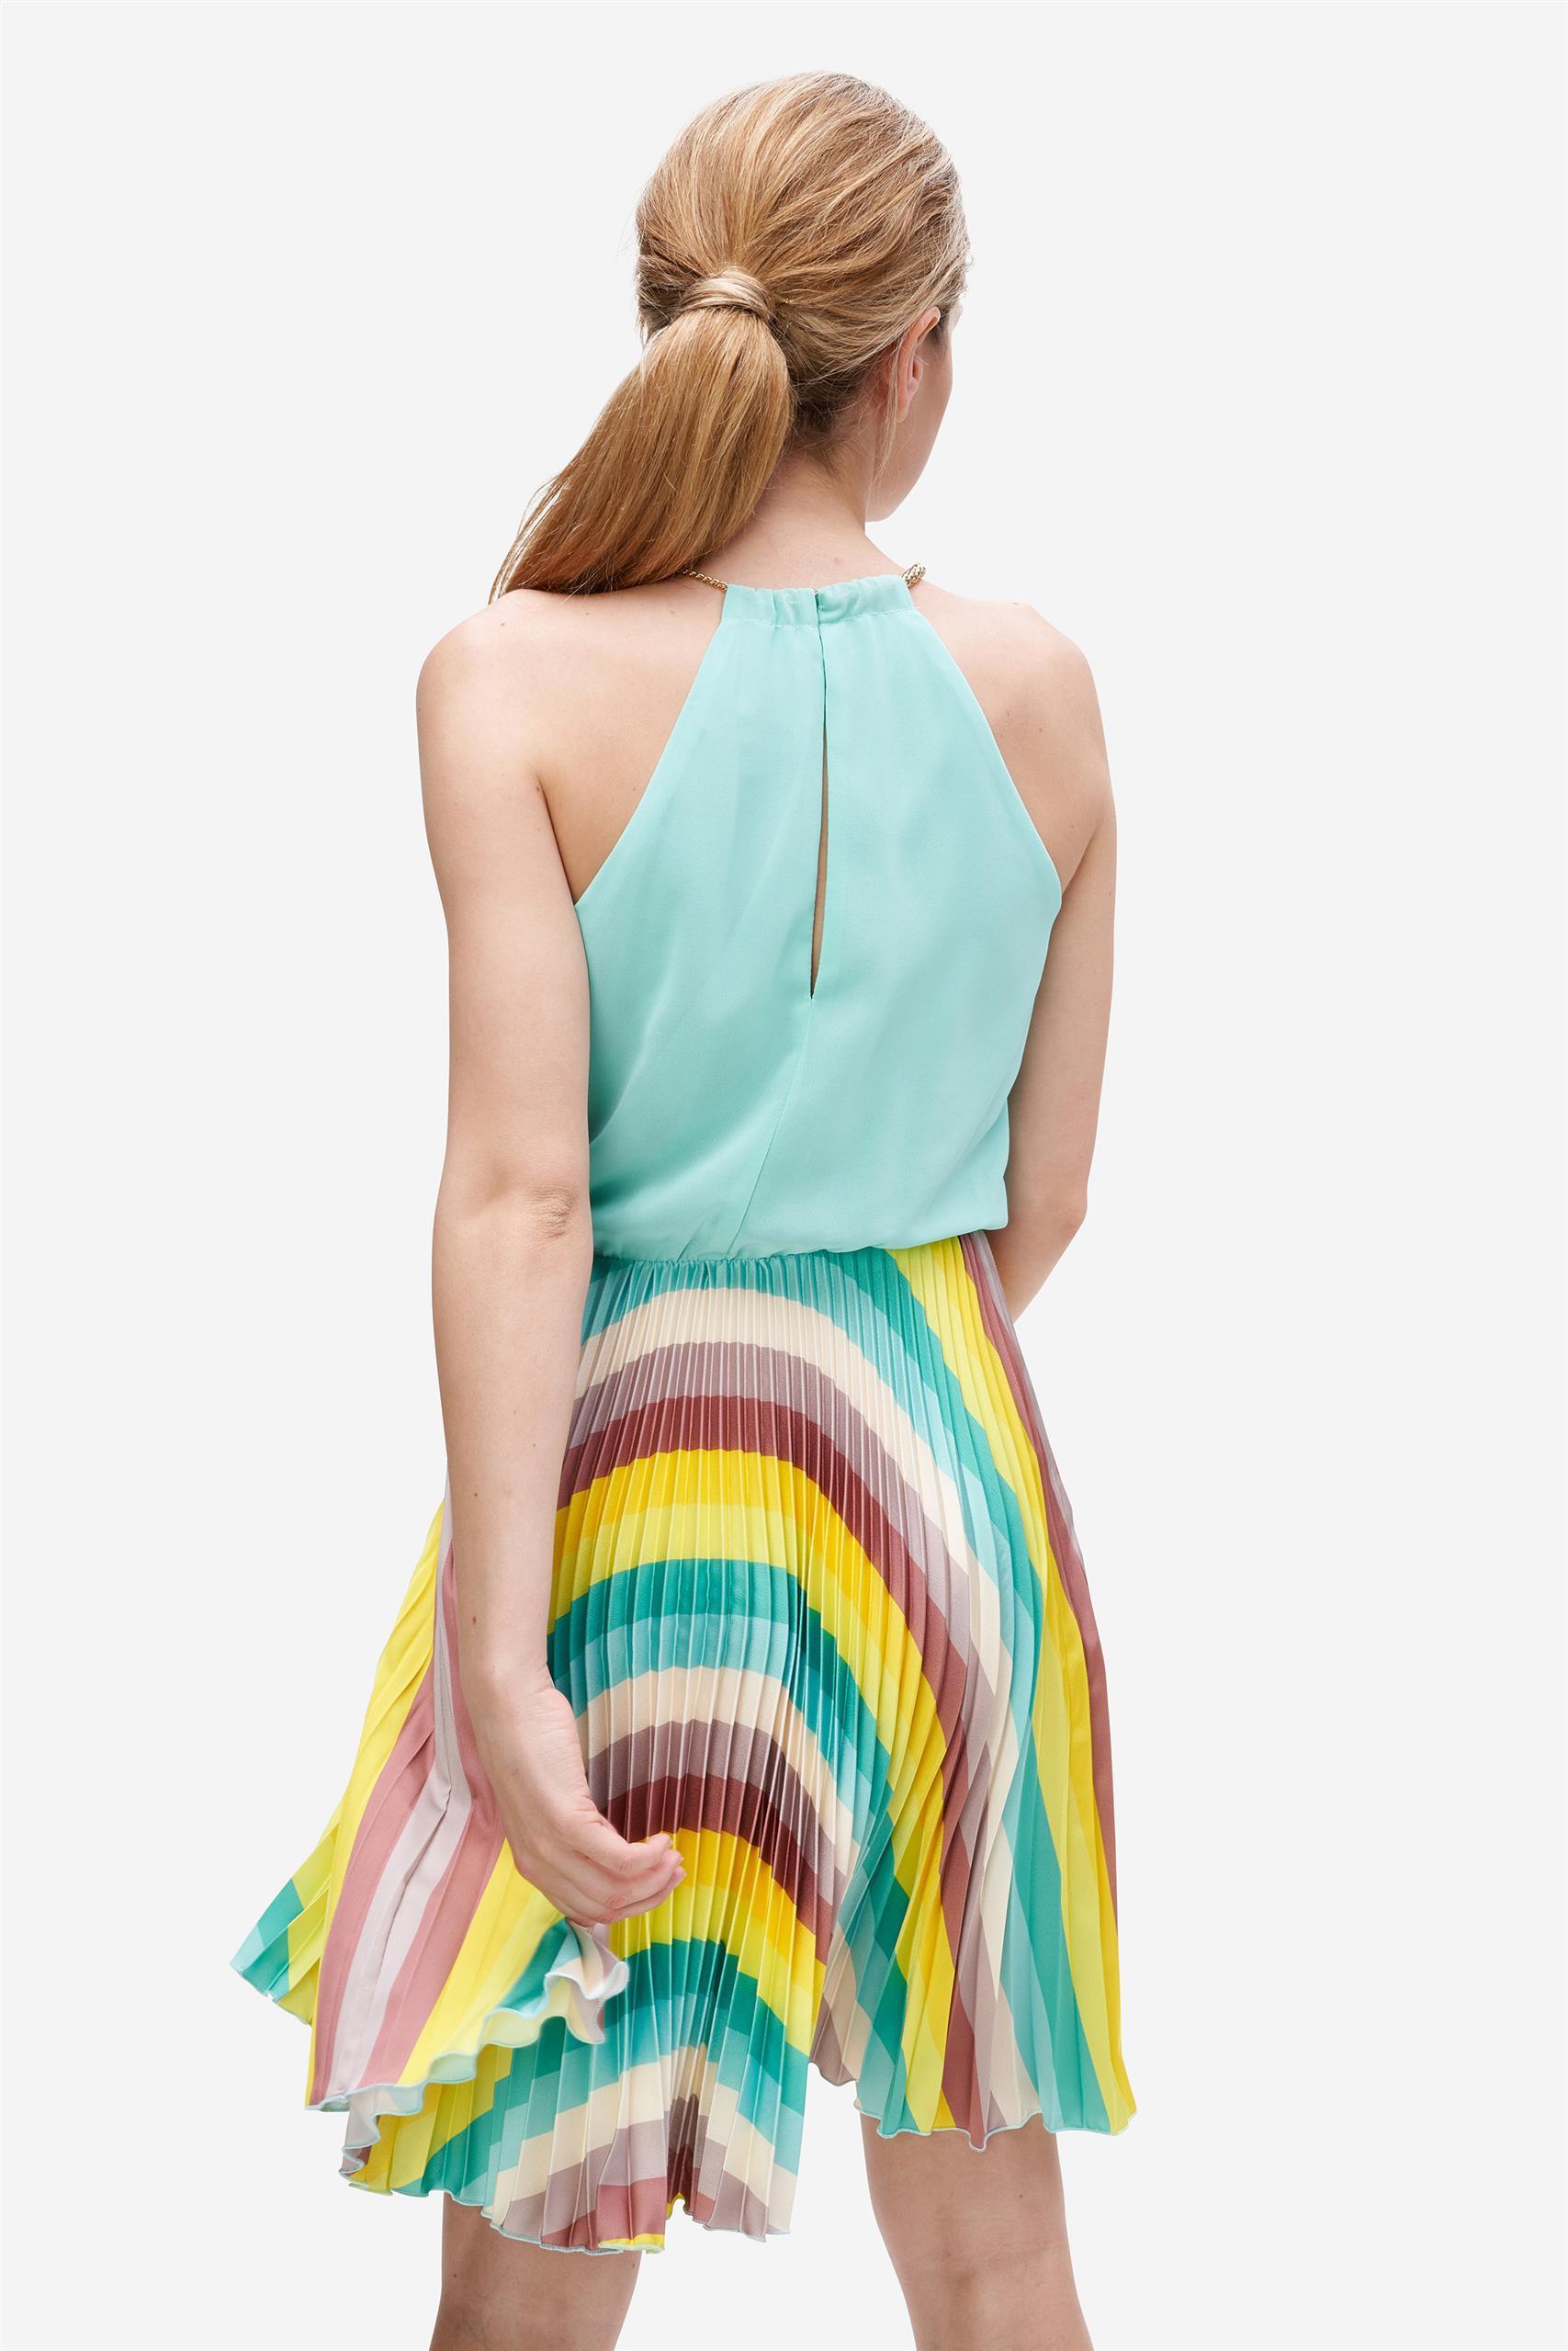 Rinascimento Neckholderkleid Online Kaufen  Fashionzone